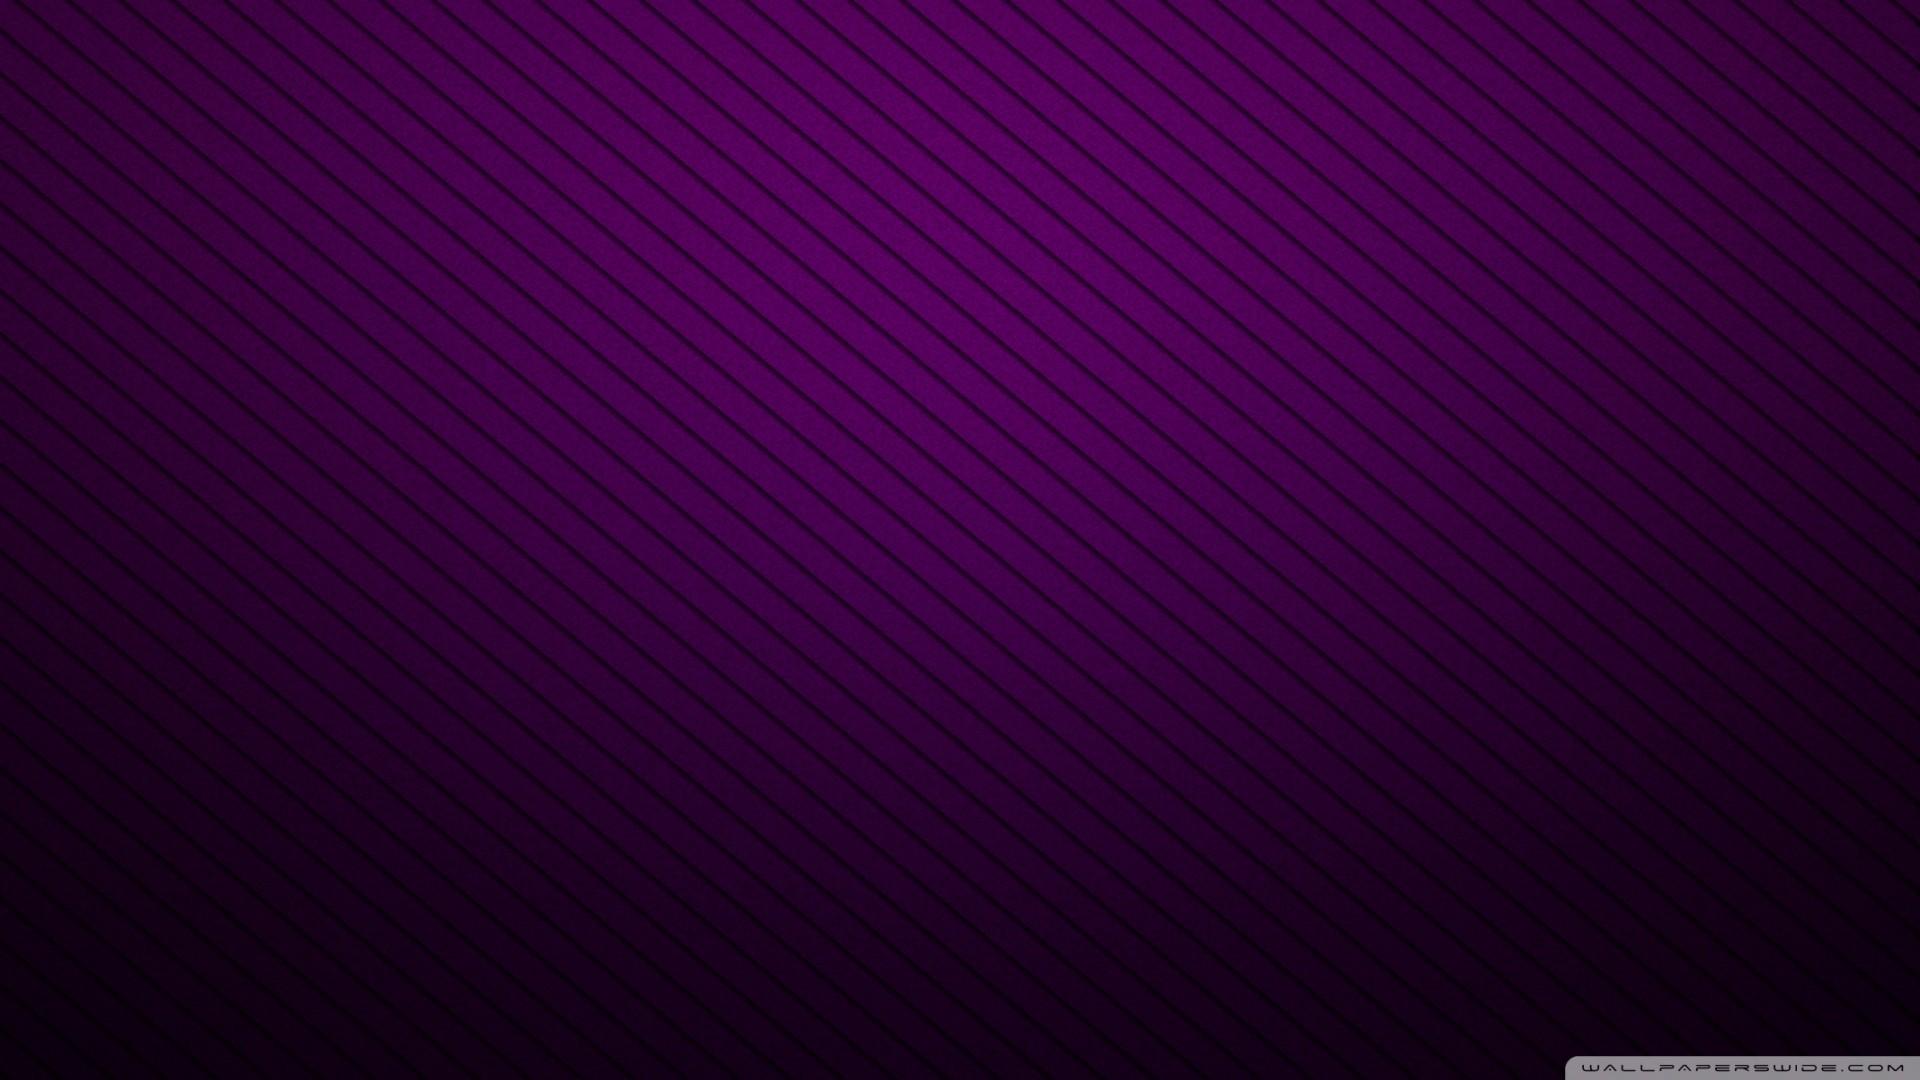 … 60 Breathtaking Dark Wallpapers For Your Desktop – Hongkiat